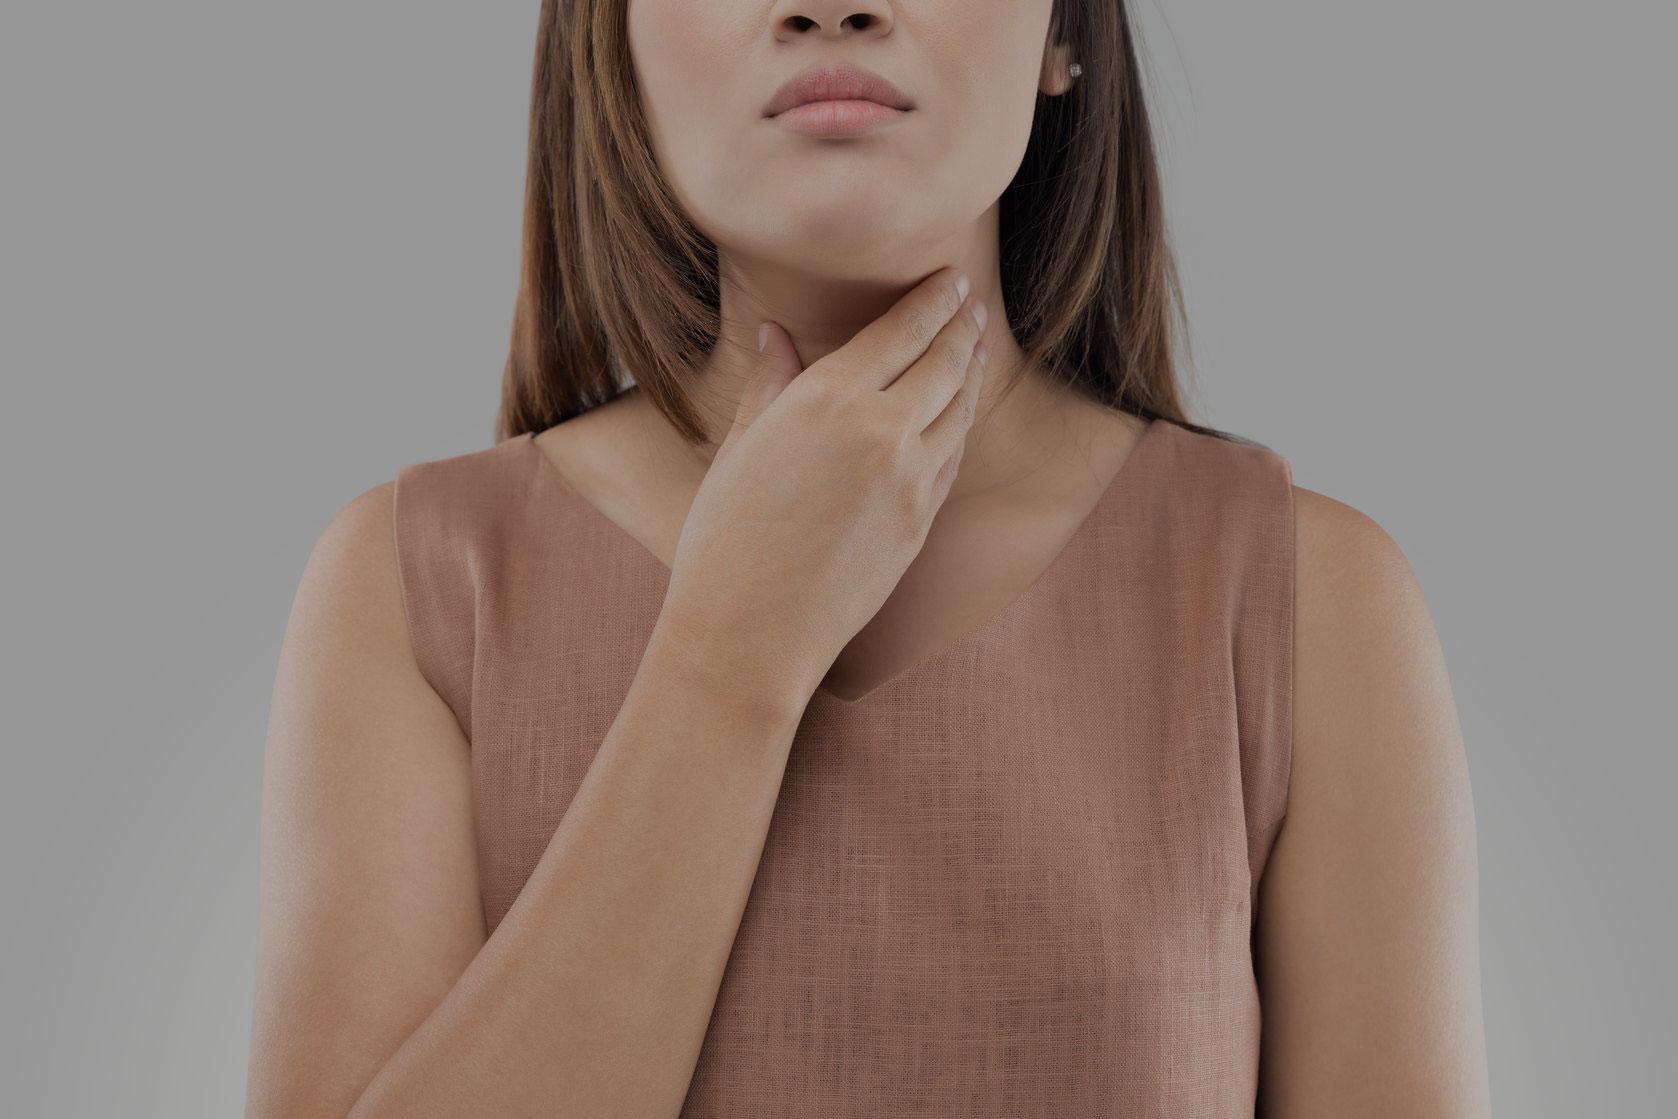 problemas de garganta